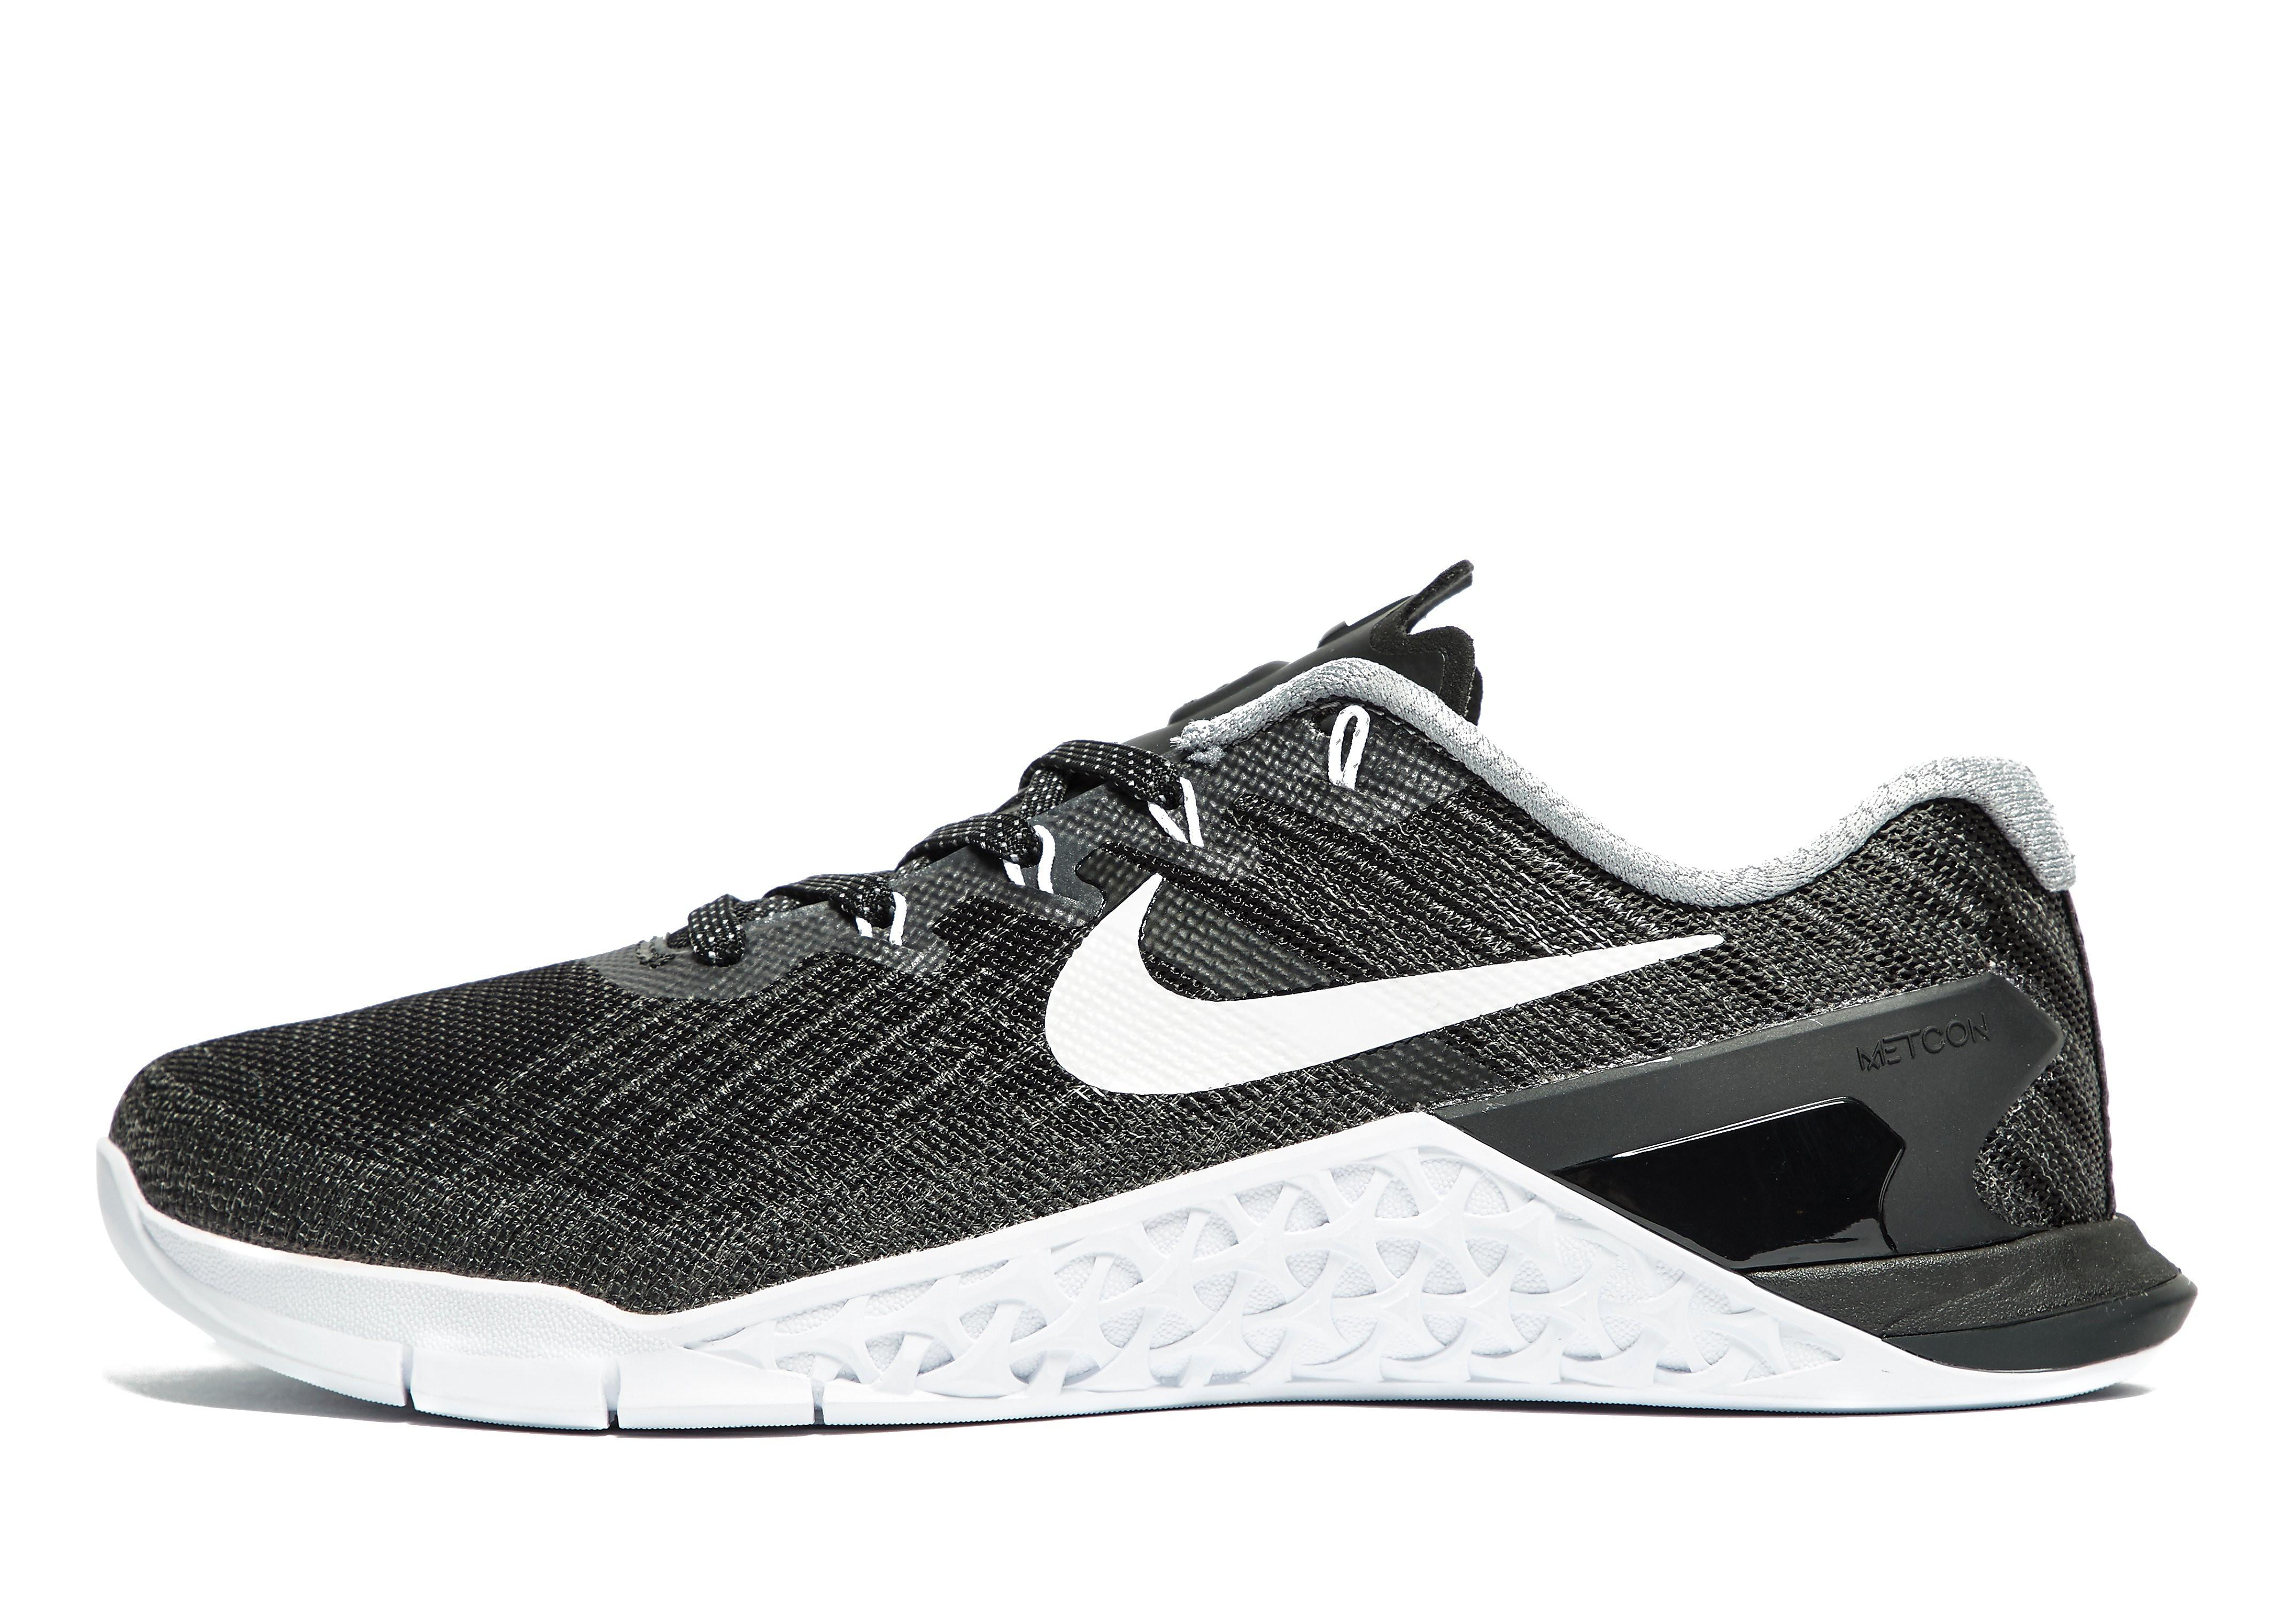 Nike Metcon 3 Femme